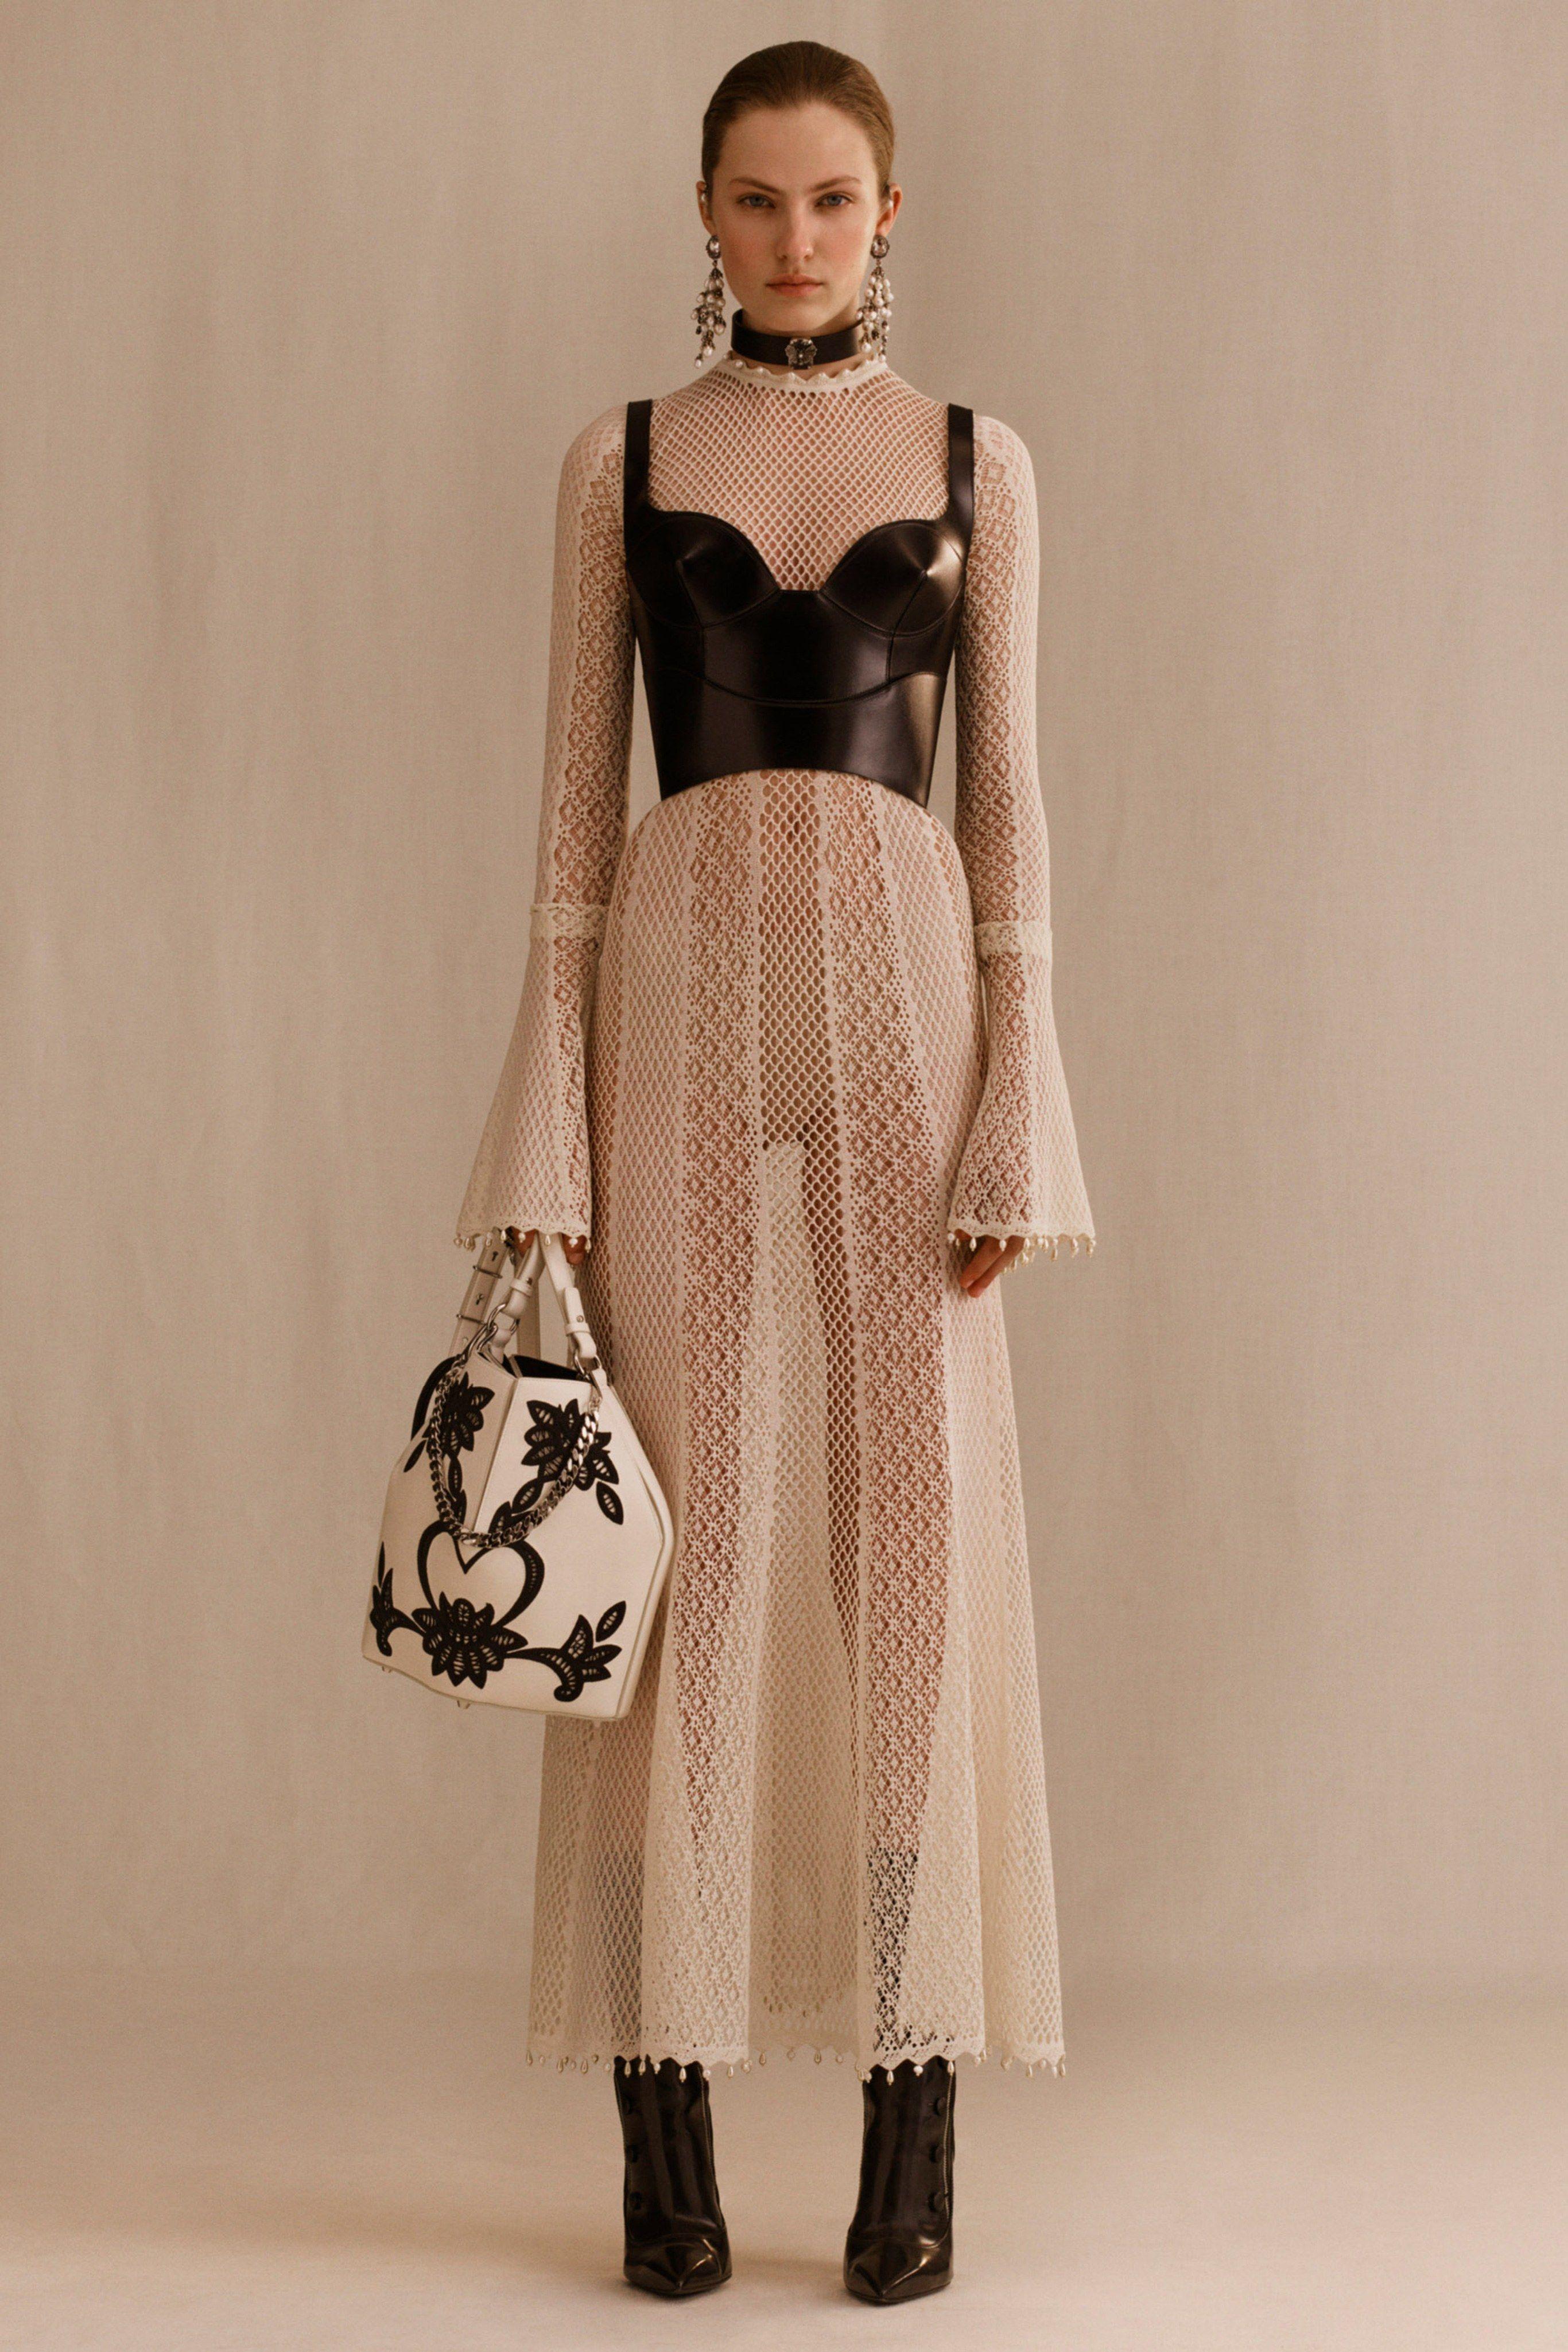 Clear lines in Alexander McQueen's Resort collection 2015